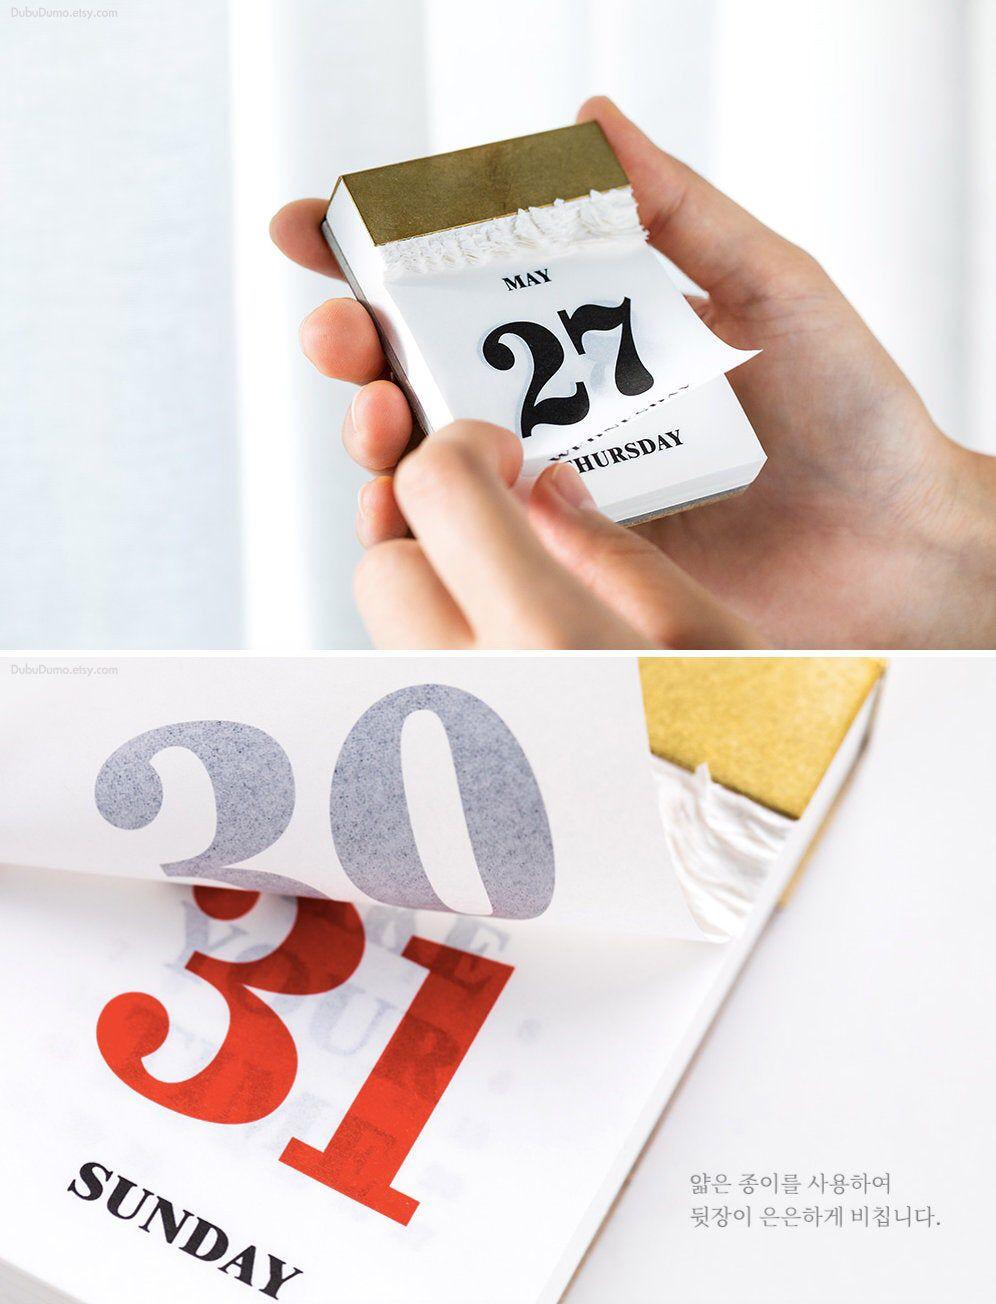 2020 Daily Calendar 2020 Desk Calendar 2020 Wall Calendar Etsy In 2020 Daily Calendar Desk Calendars Calendar